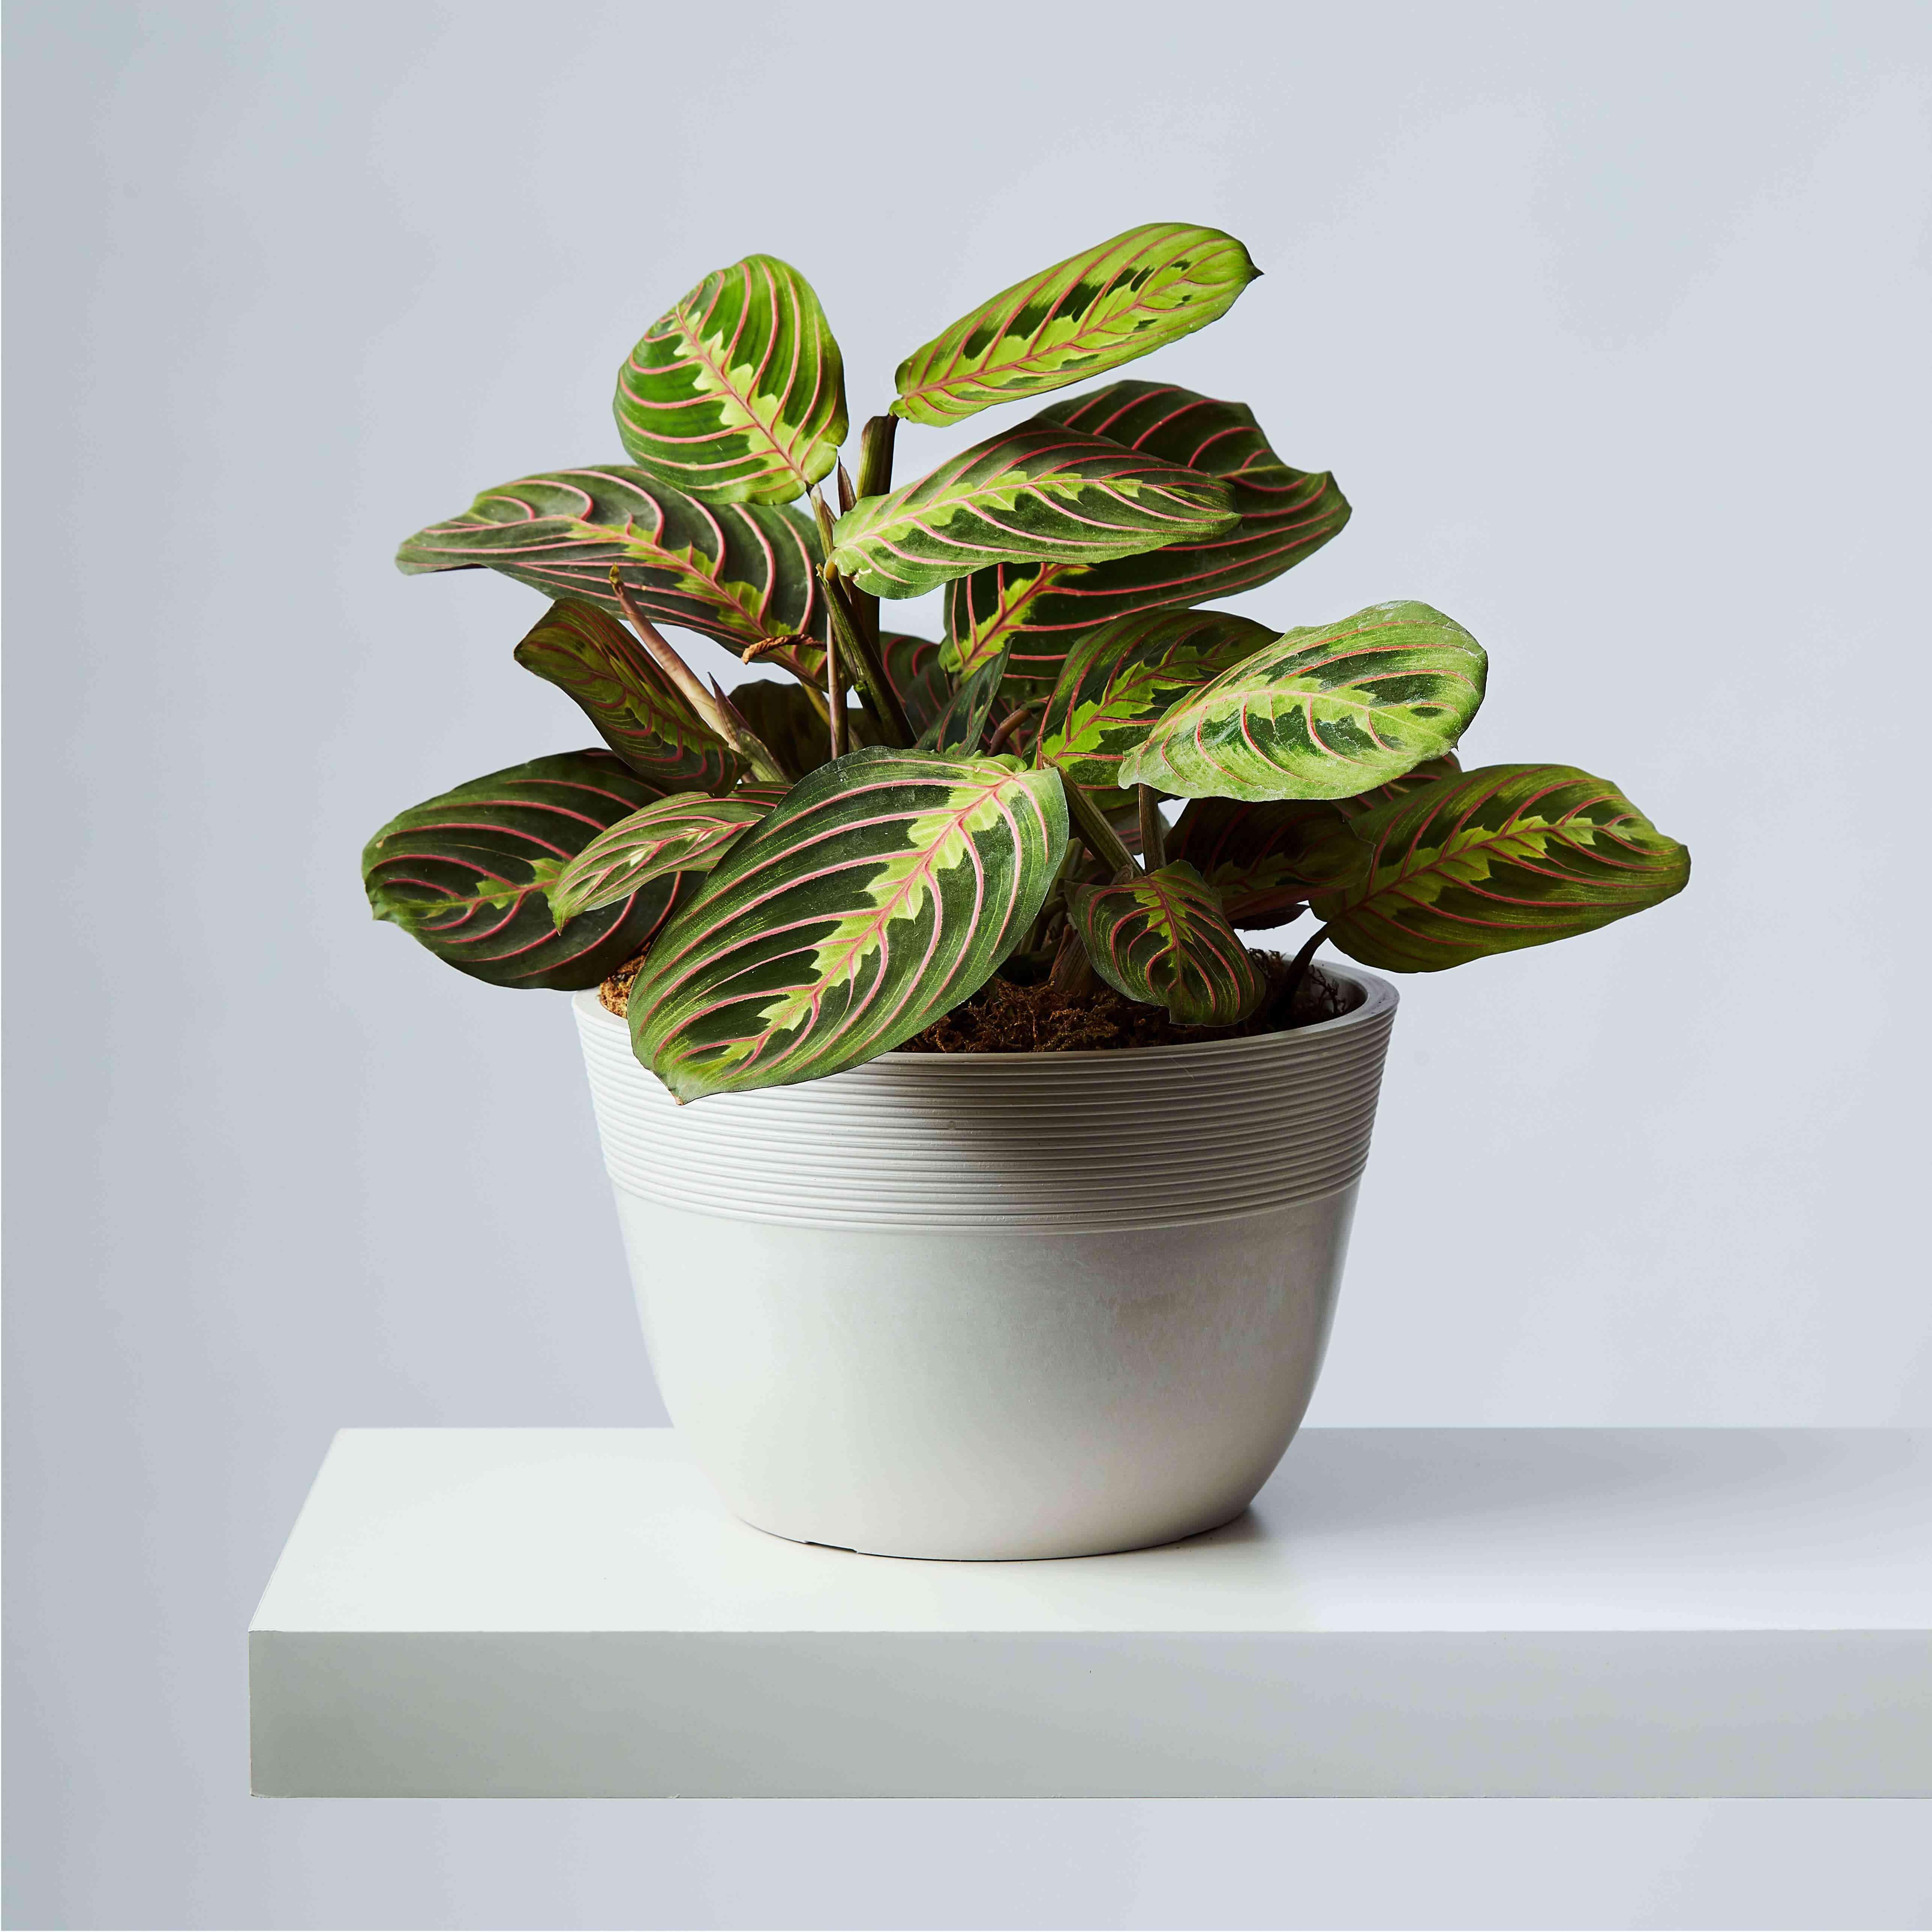 Prayer plant maranta in a ceramic pot on a floating shelf